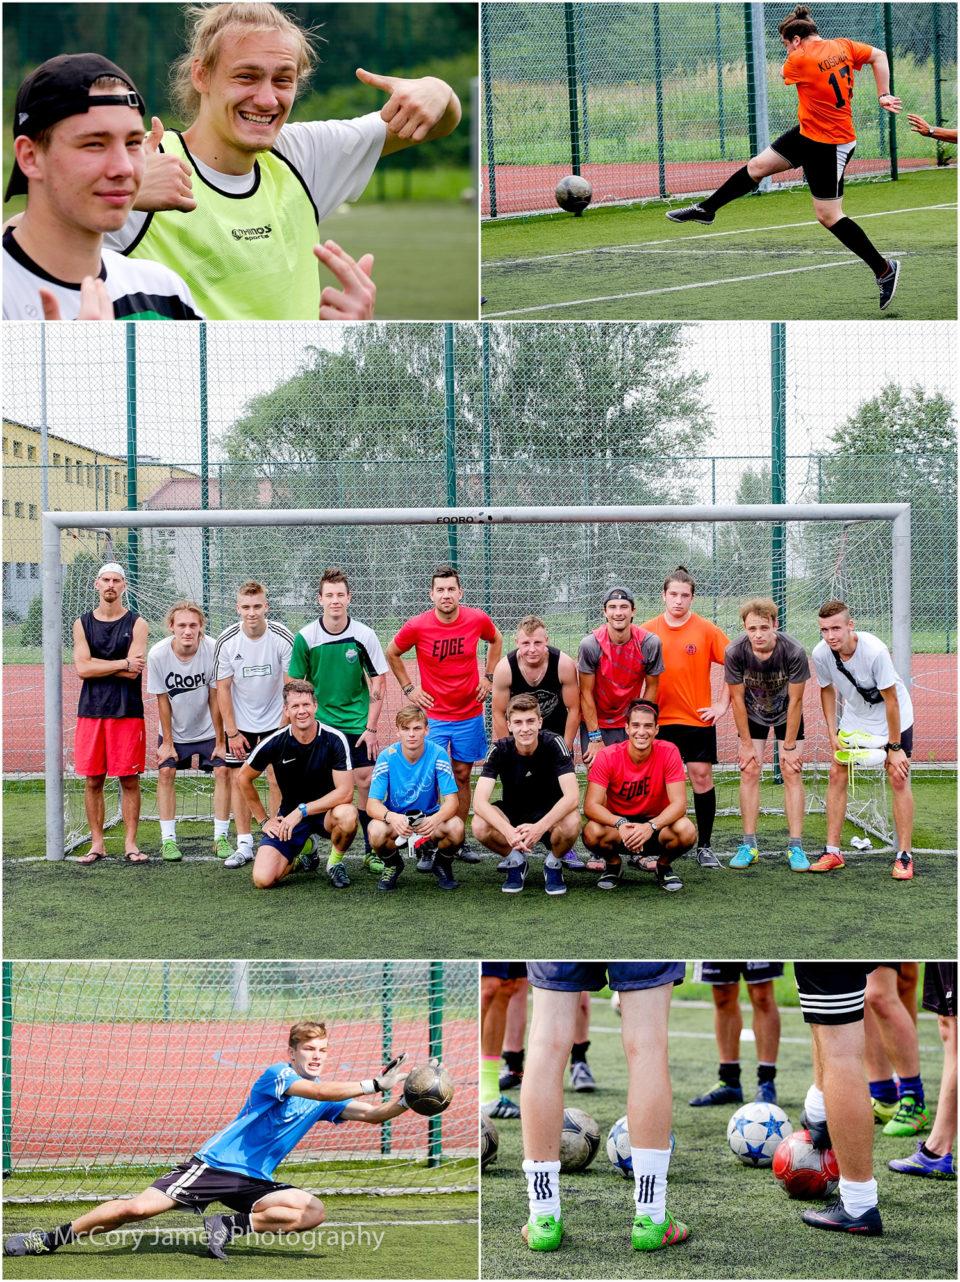 Edge Soccer Camp